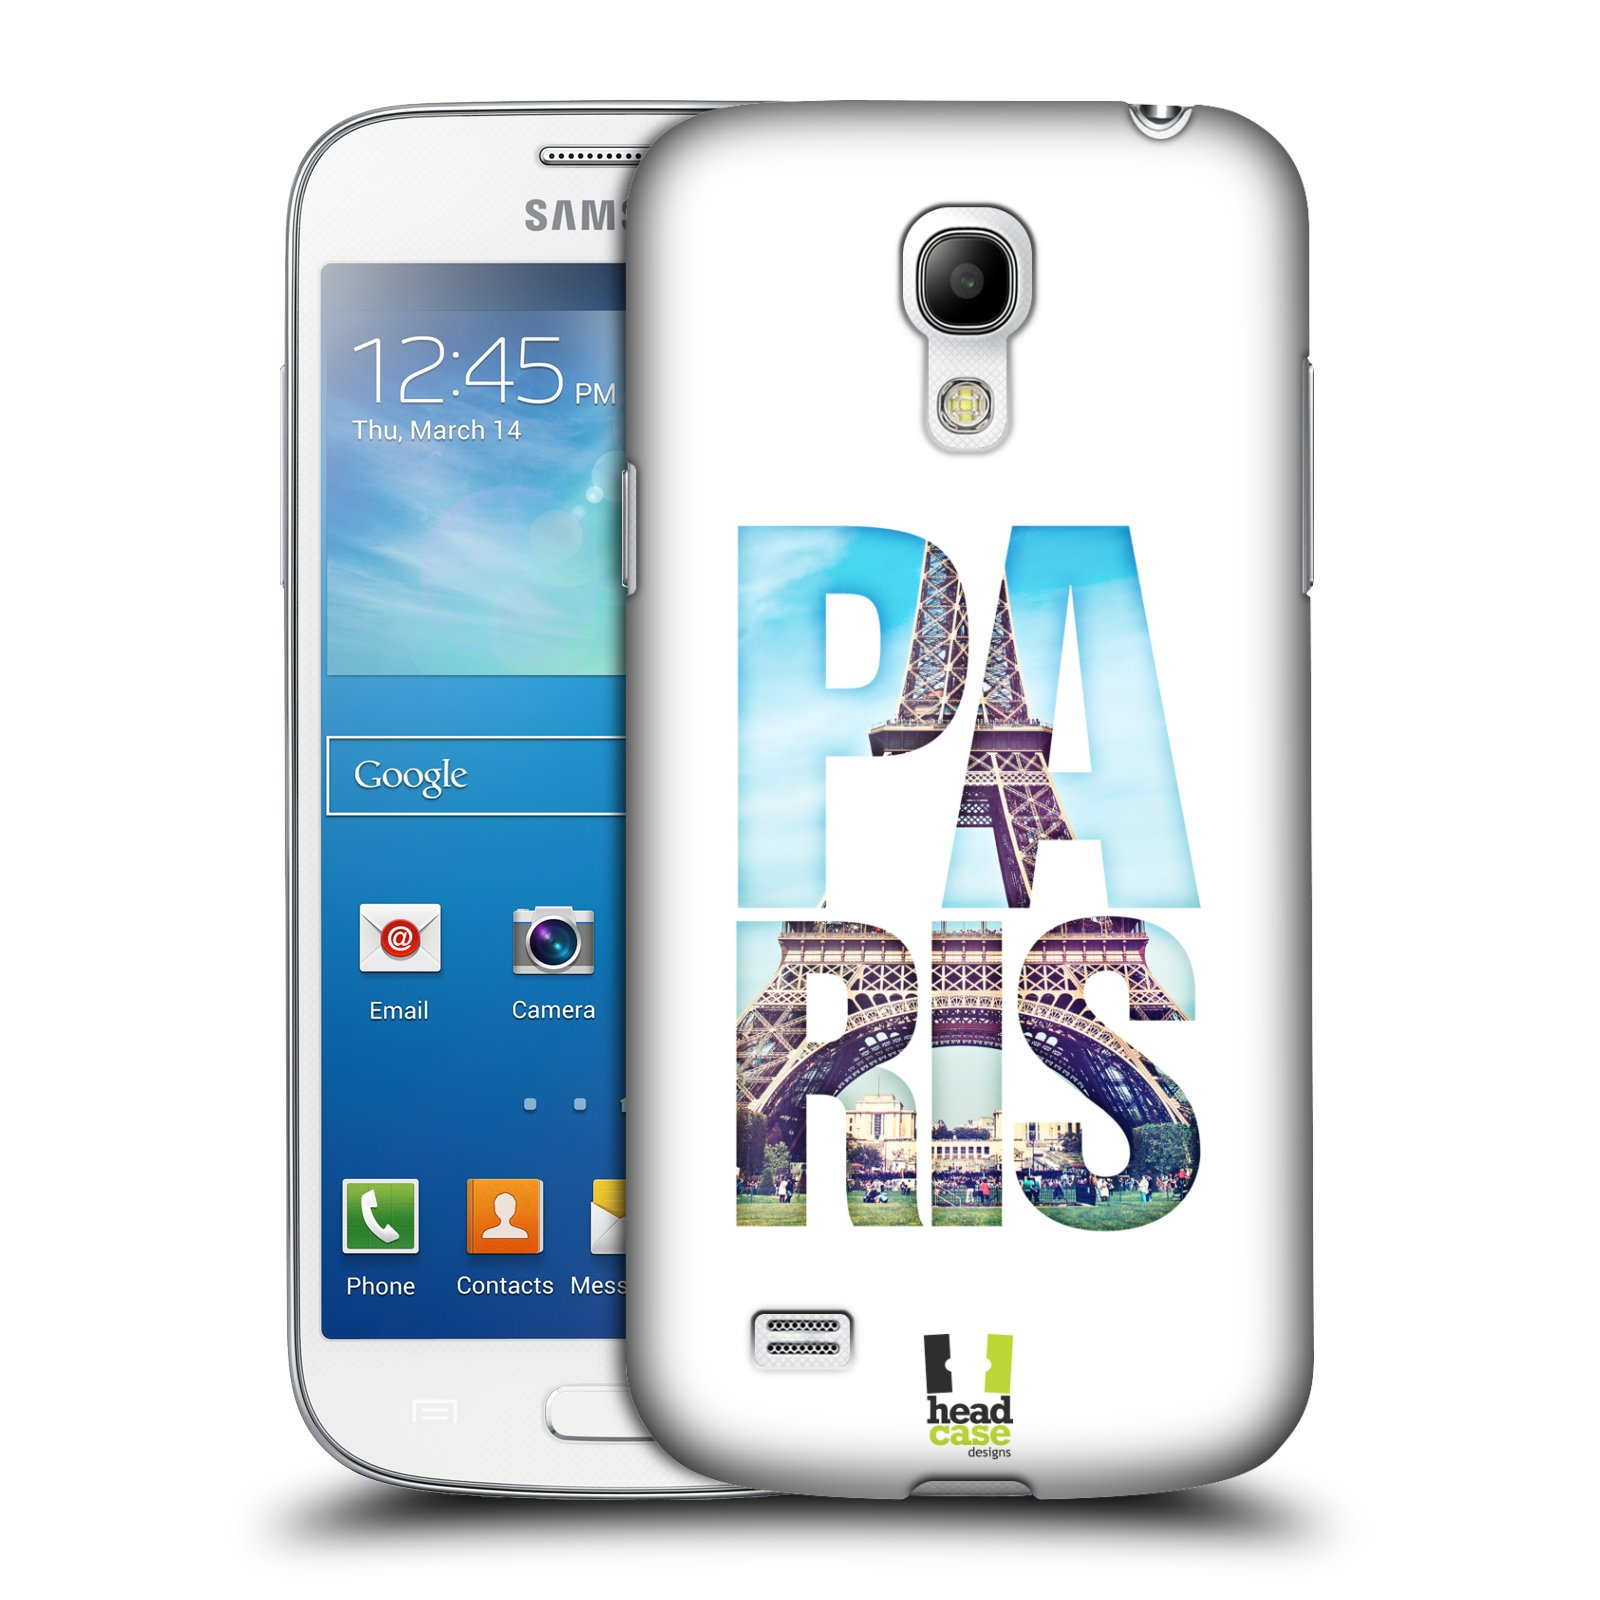 HEAD CASE plastový obal na mobil SAMSUNG Galaxy S4 MINI / S4 MINI VE (i9190, i9195i, i9195) vzor Města foto a nadpis FRANCIE, PAŘÍŽ, EIFFELOVA VĚŽ